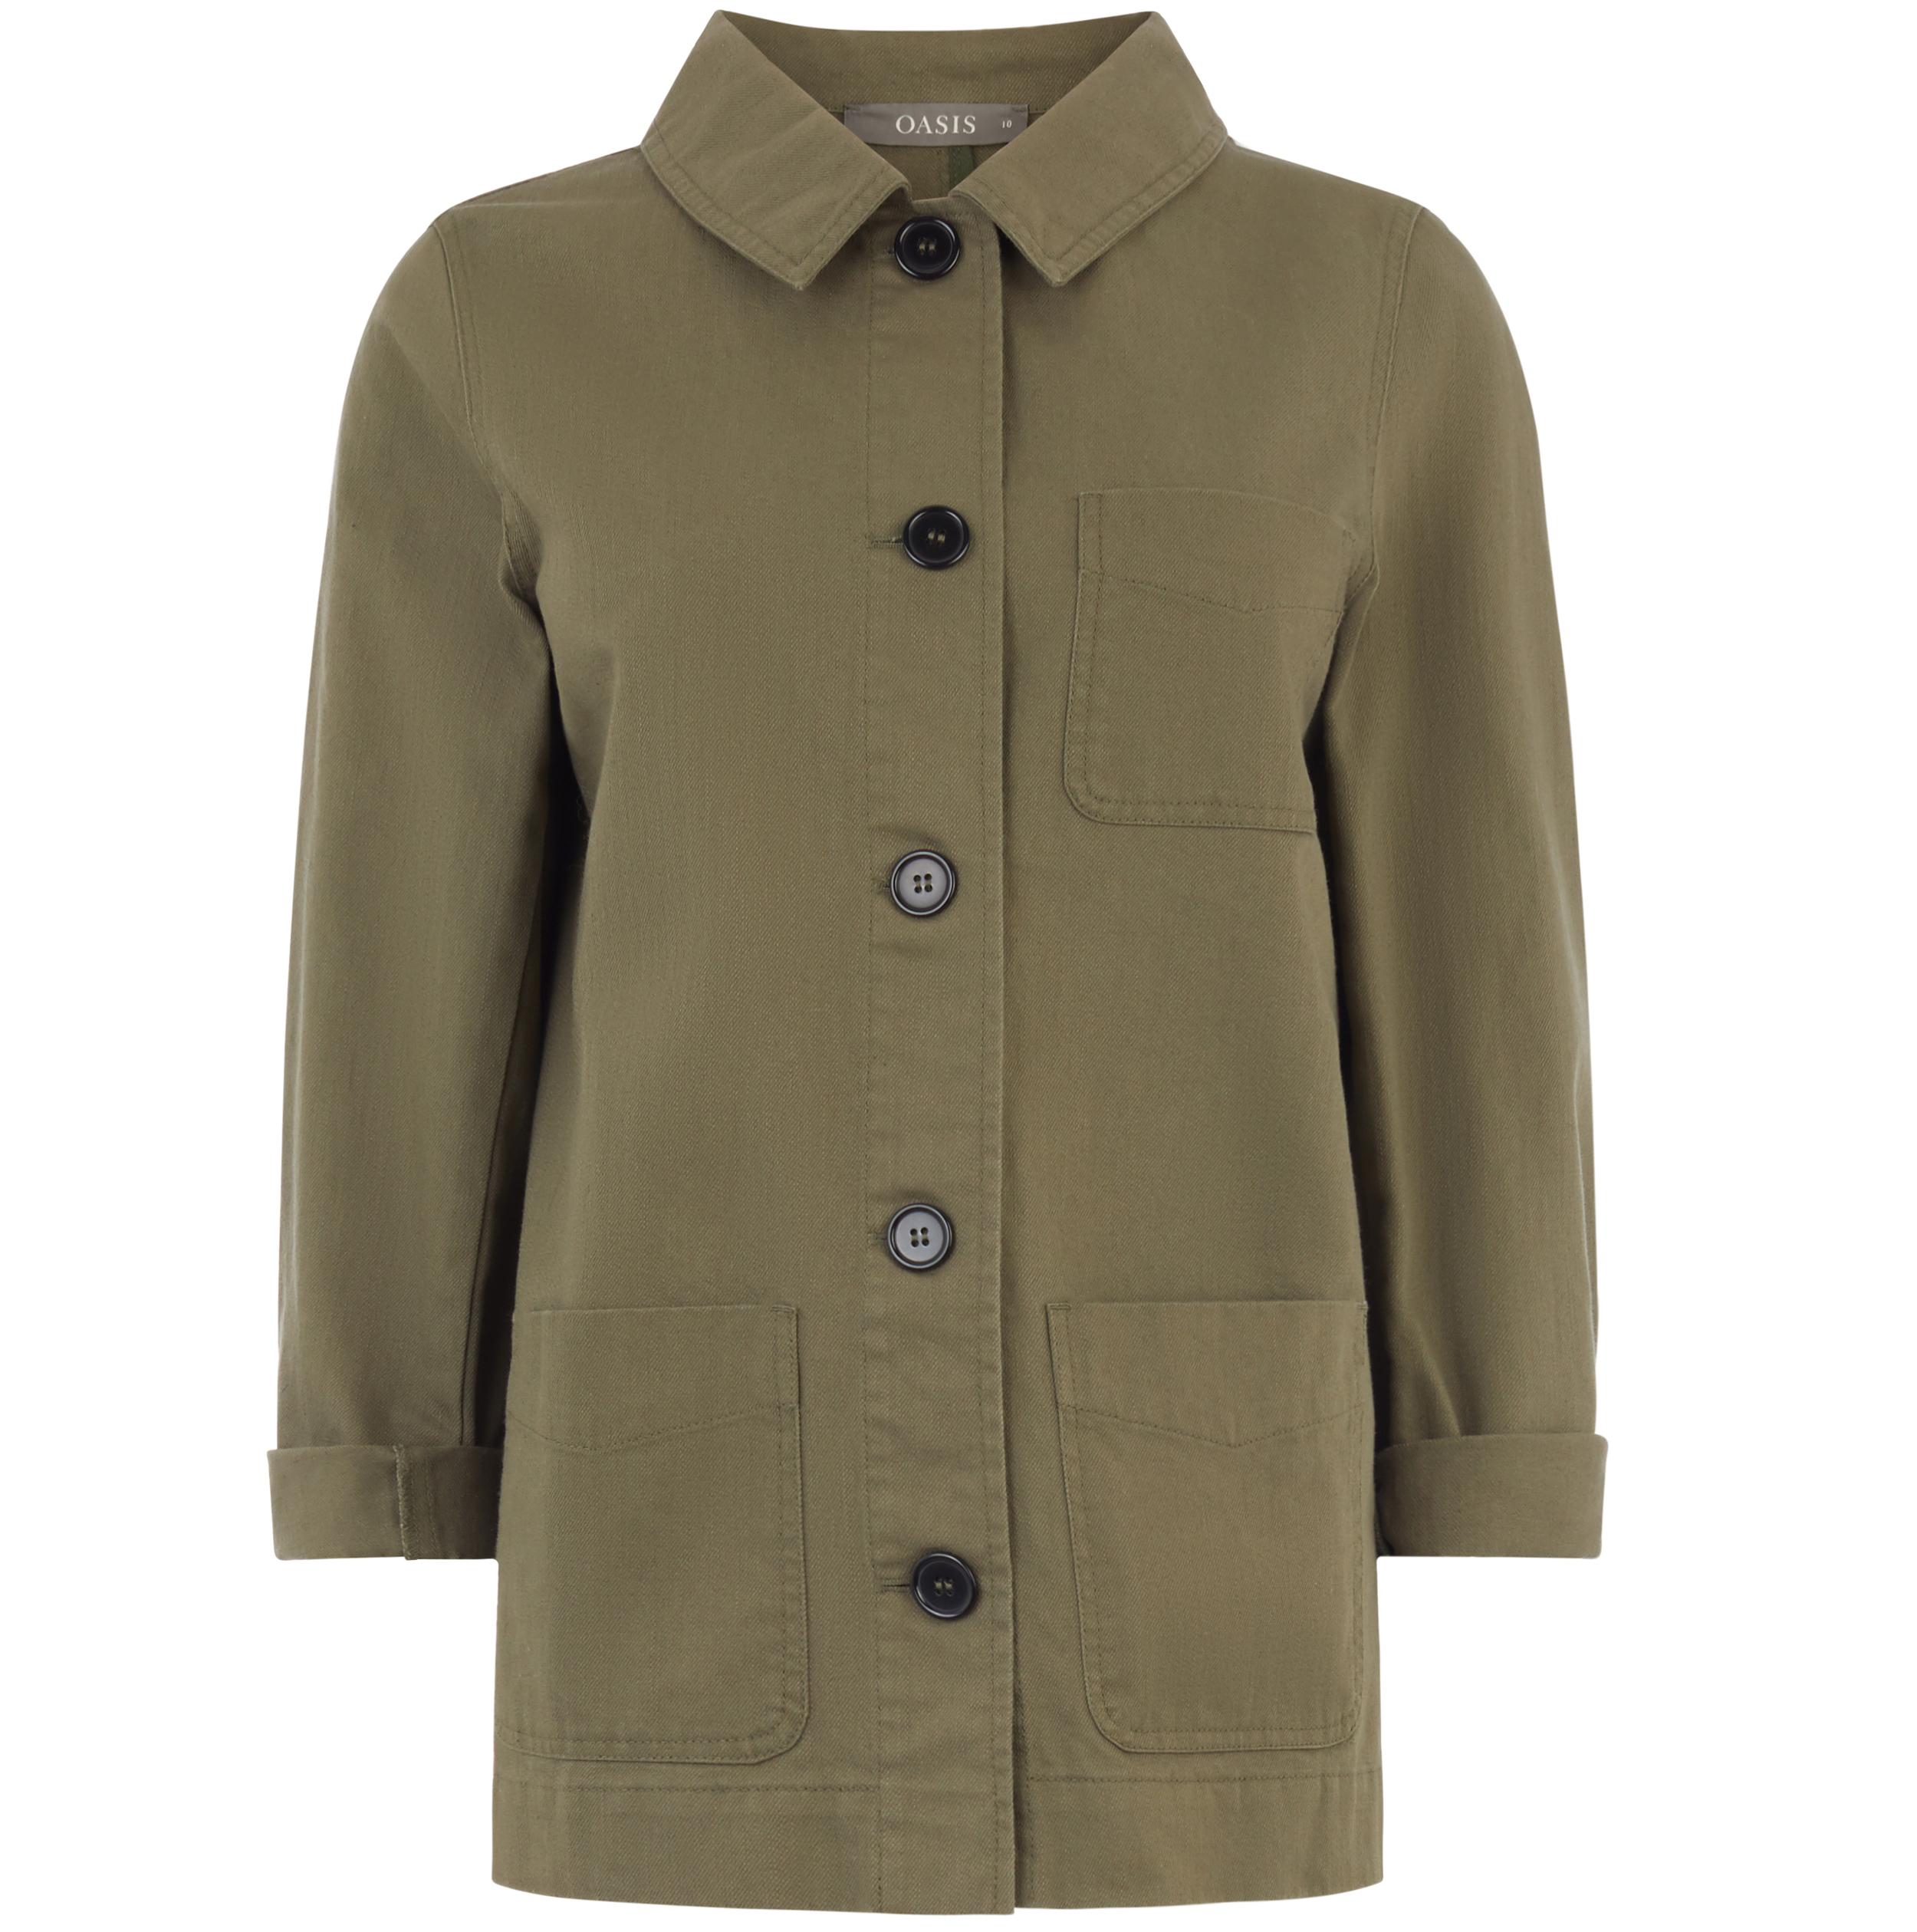 Oasis Utility Jacket